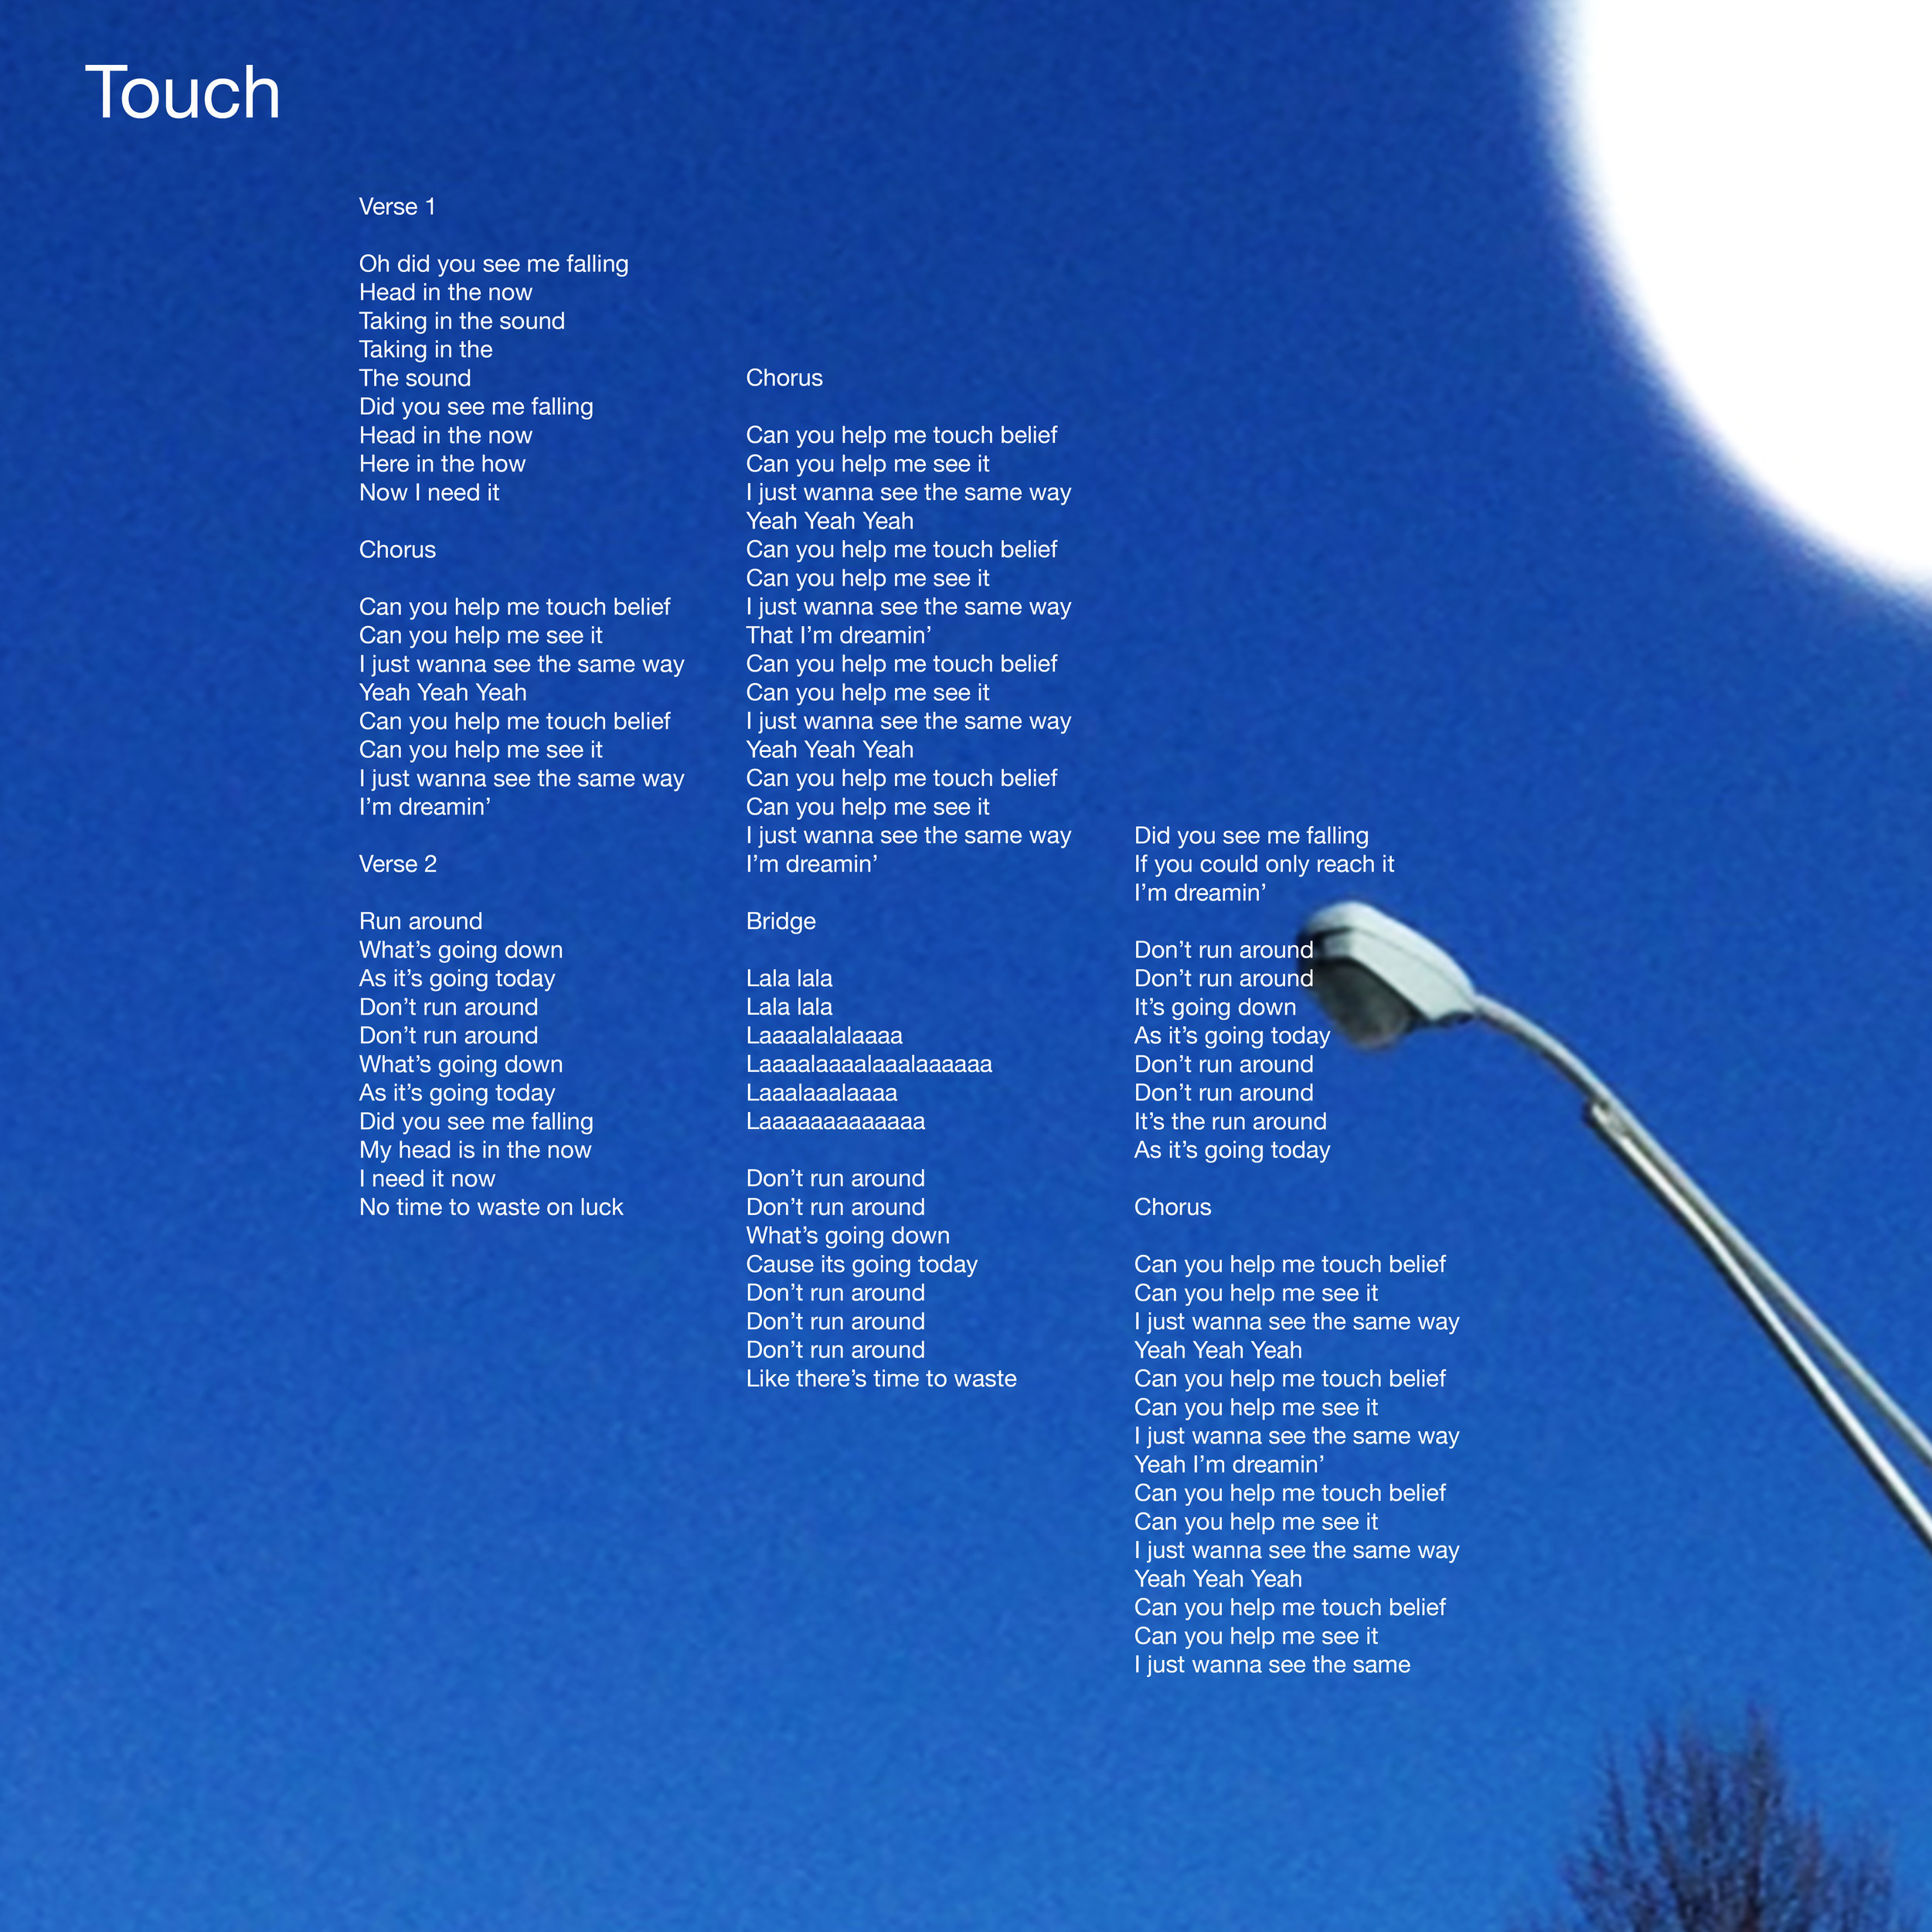 TouchLyricArtDLX.jpg